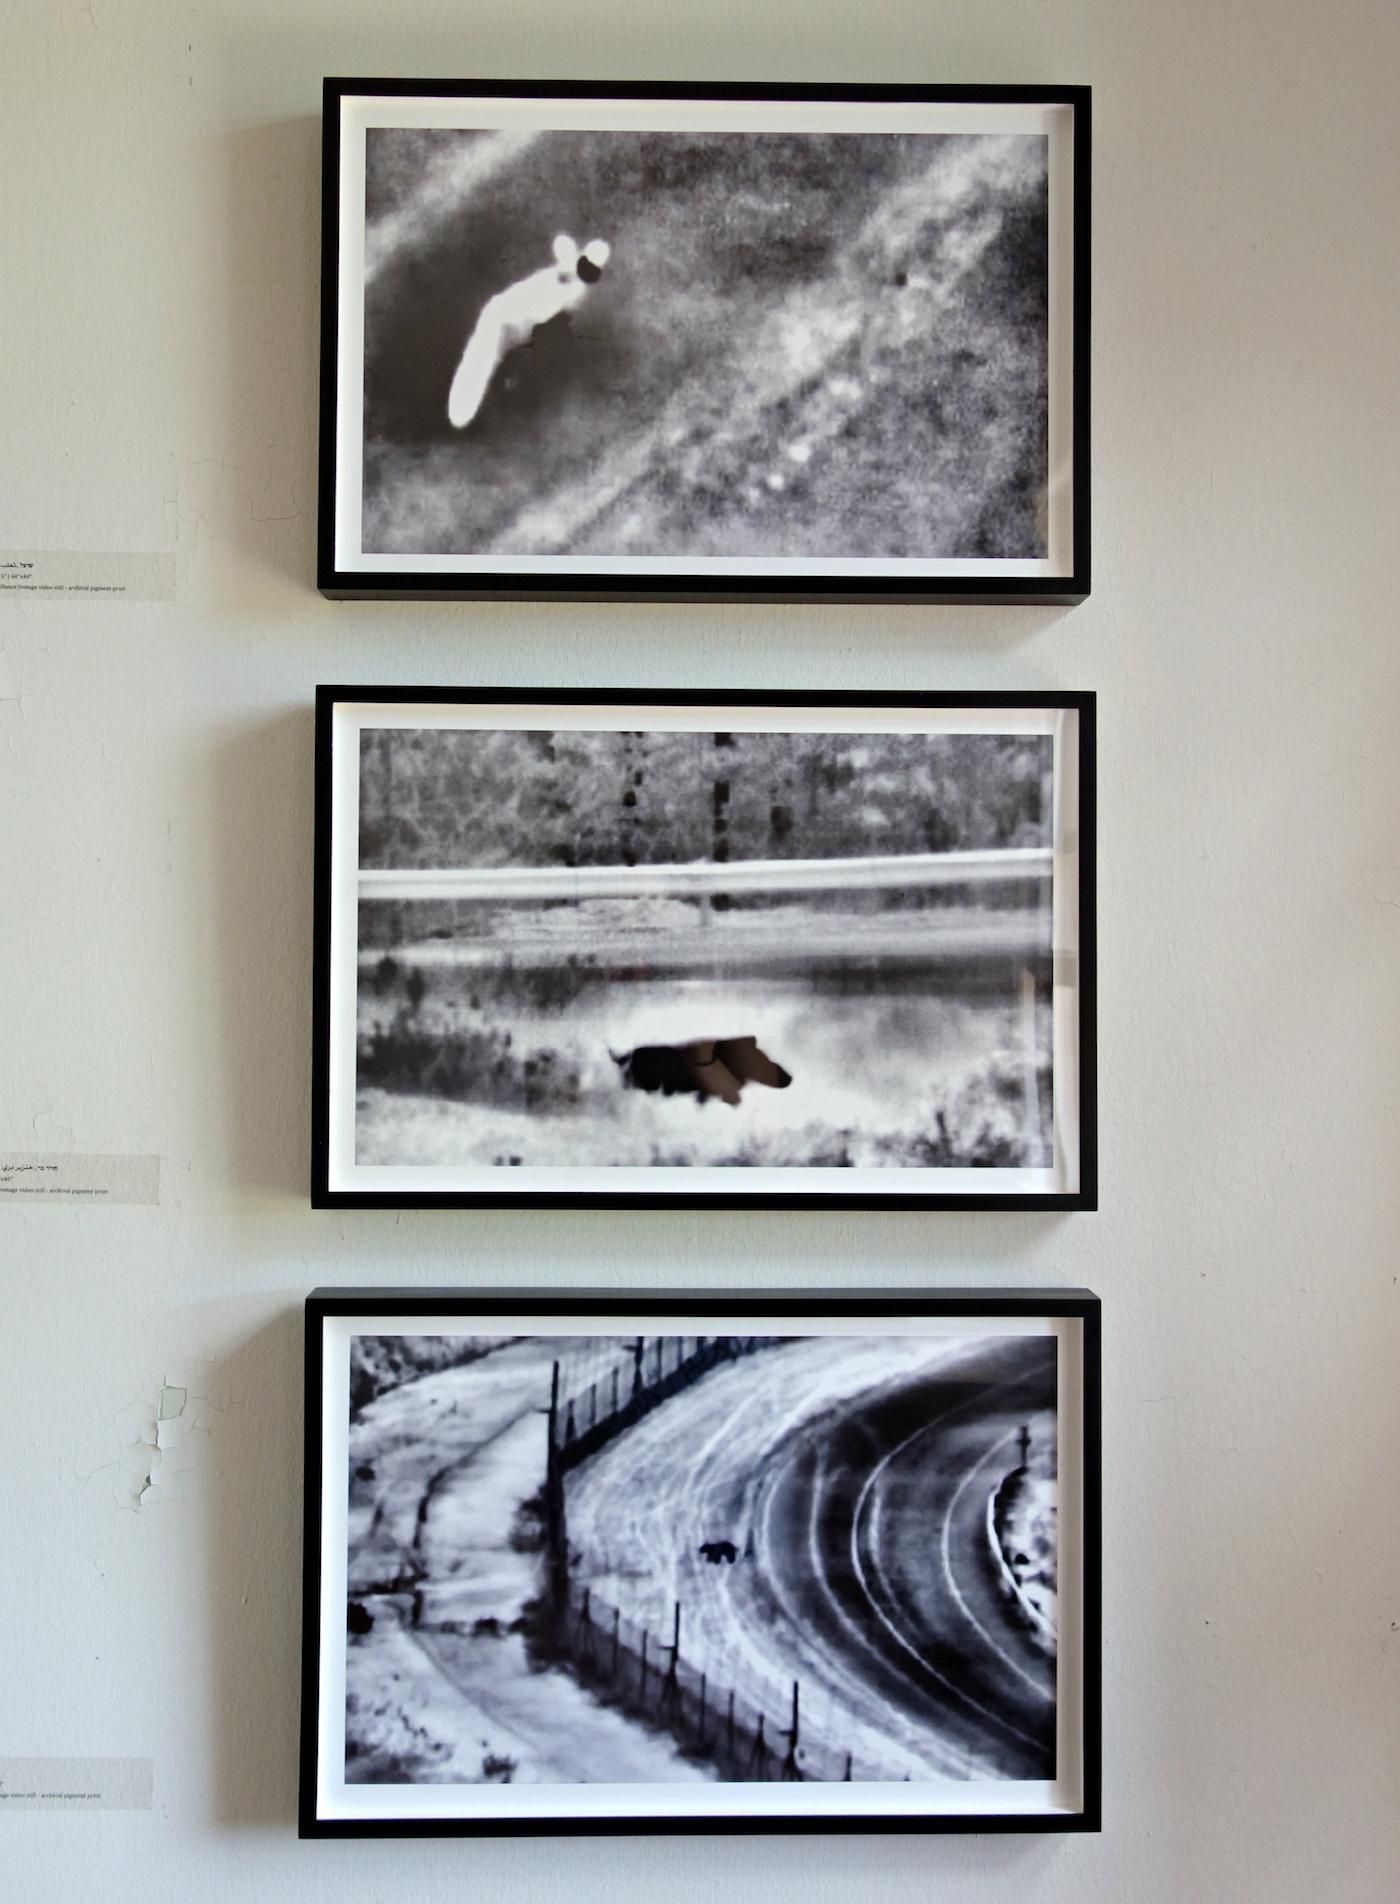 Surveillance footage stills of animals by Netta Laufer -  Installation at Governor's Island Art Fair